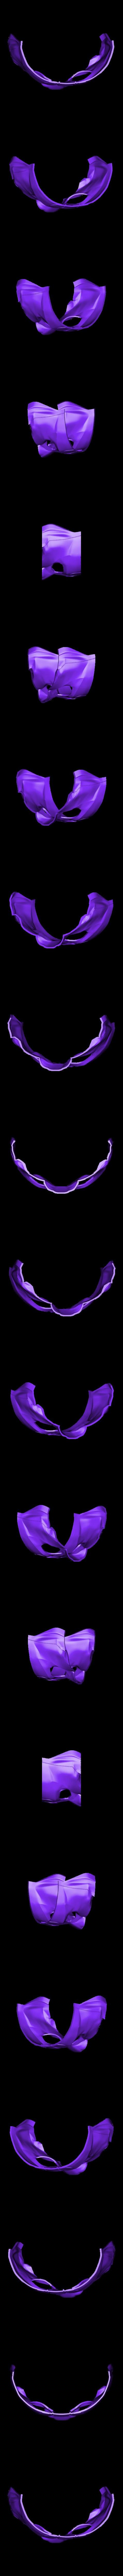 Part_2_v4.stl Download free STL file Overwatch Oni Genji • 3D printable object, VillainousPropShop